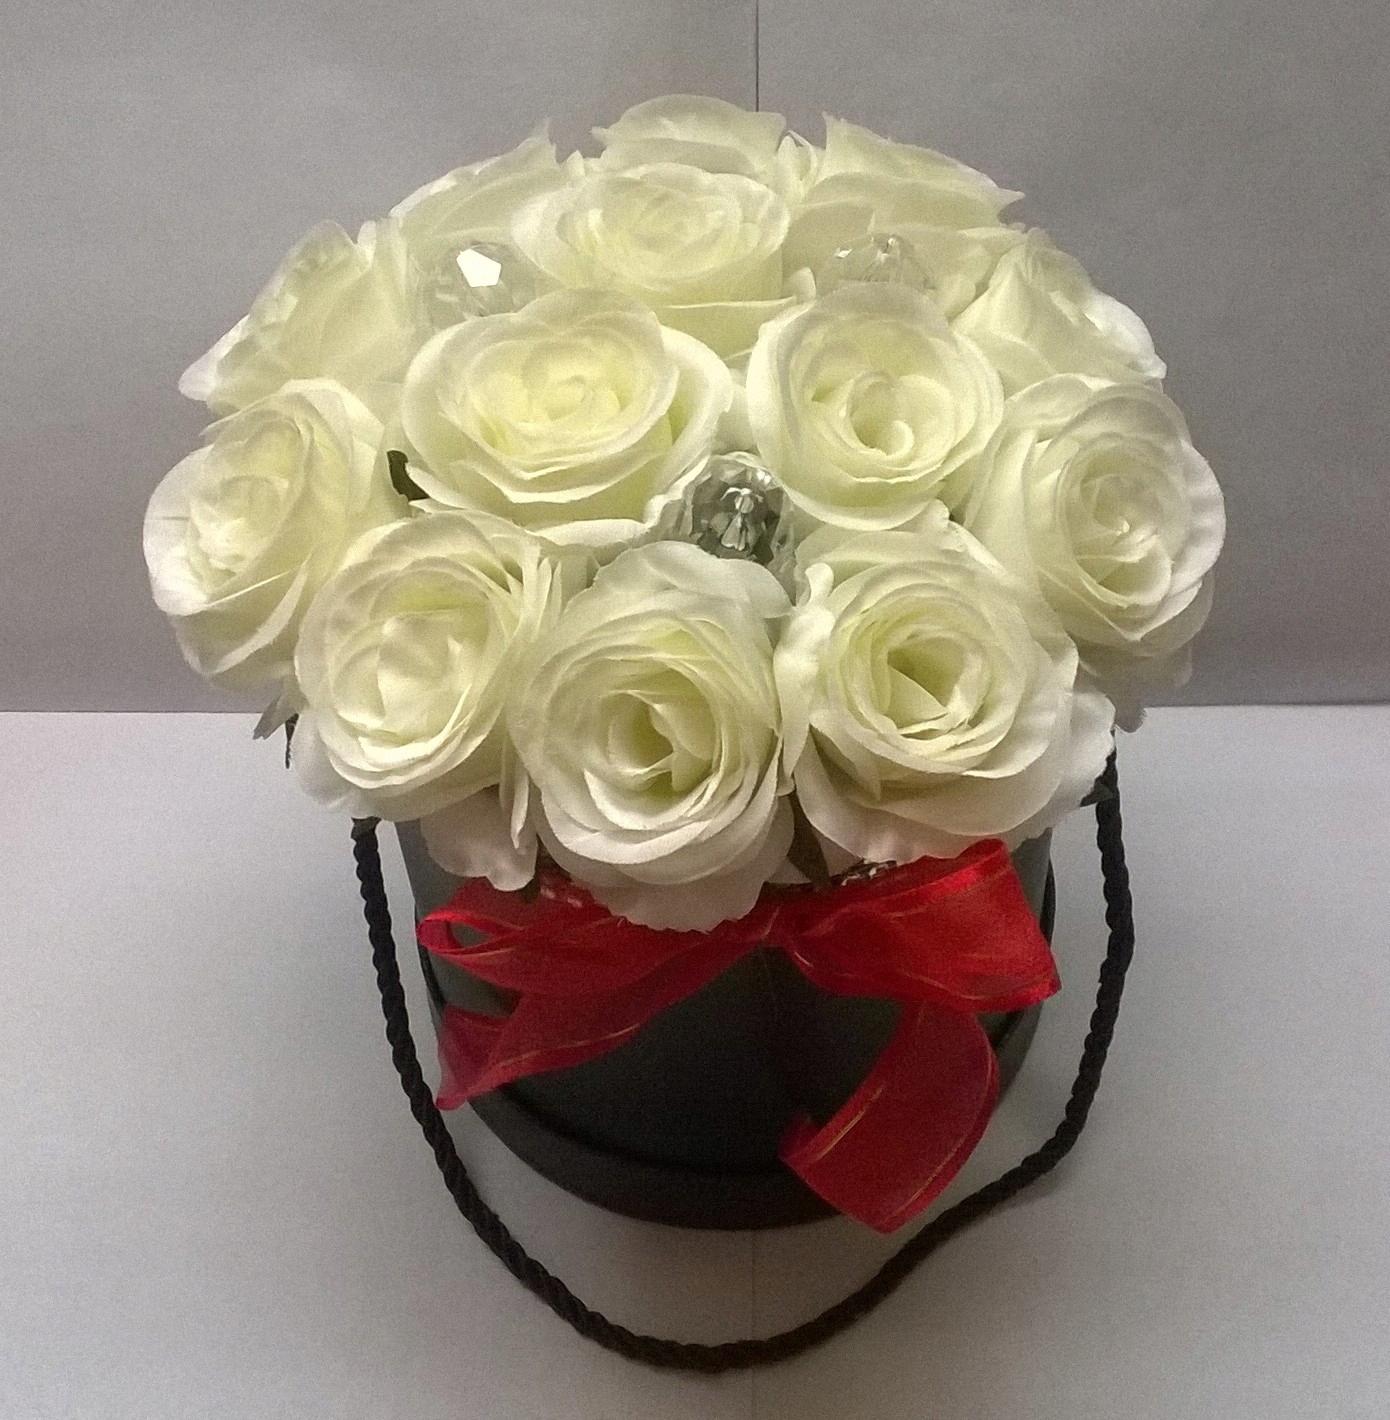 Цветочная коробка белых роз